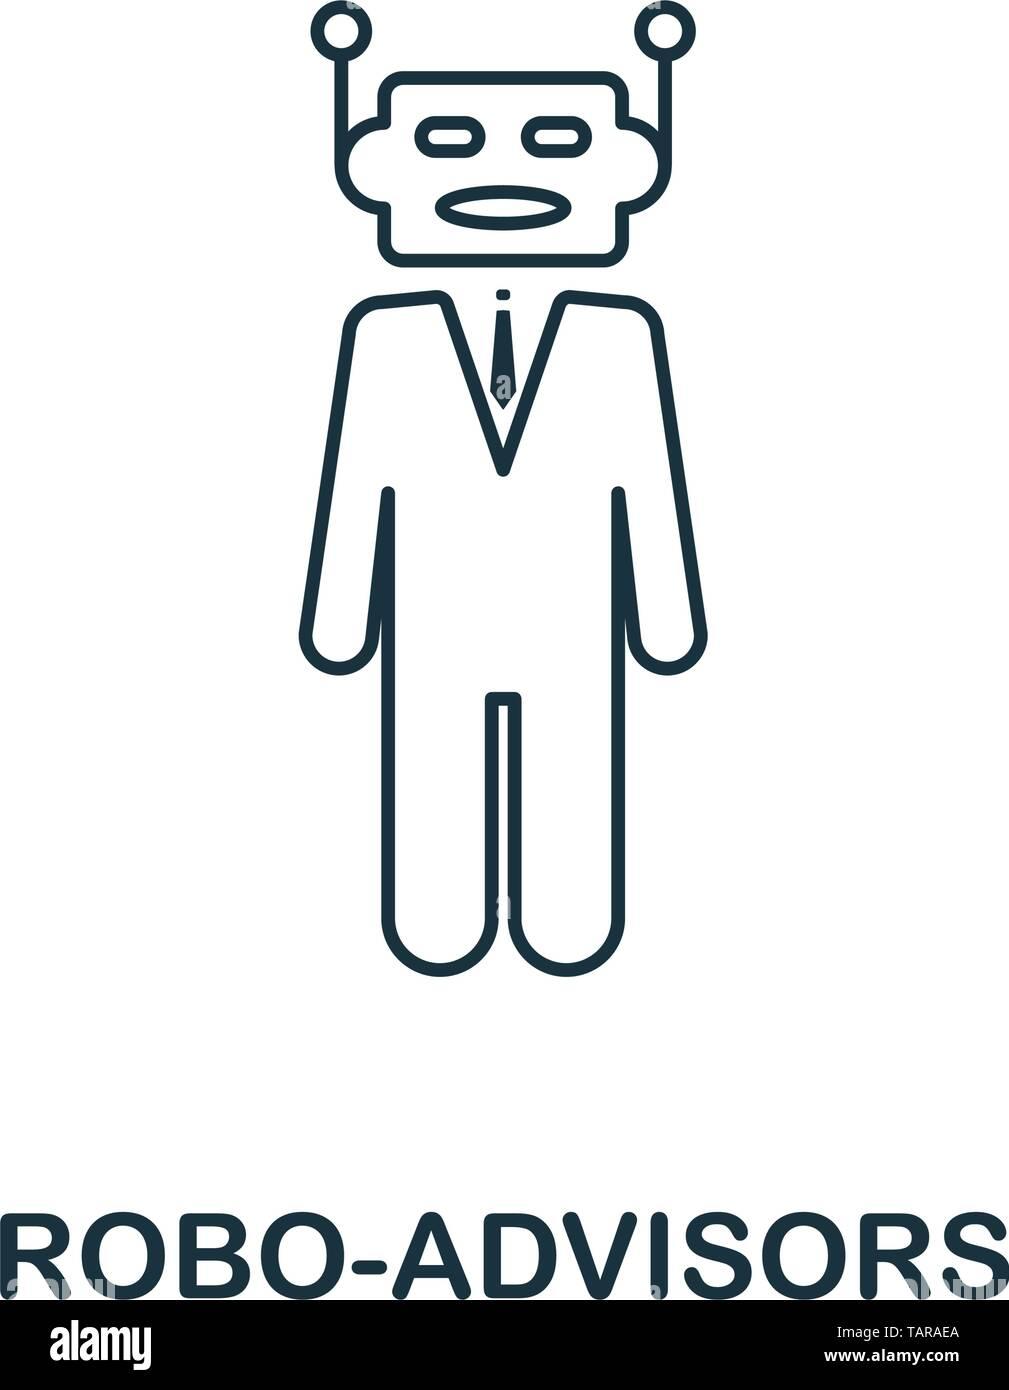 Robo-Advisors Symbol Umrisse Stil. Thin Line Design von fintech icons Collection. Pixel Perfect robo-Berater Symbol für Web Design, Apps, Software Stock Vektor